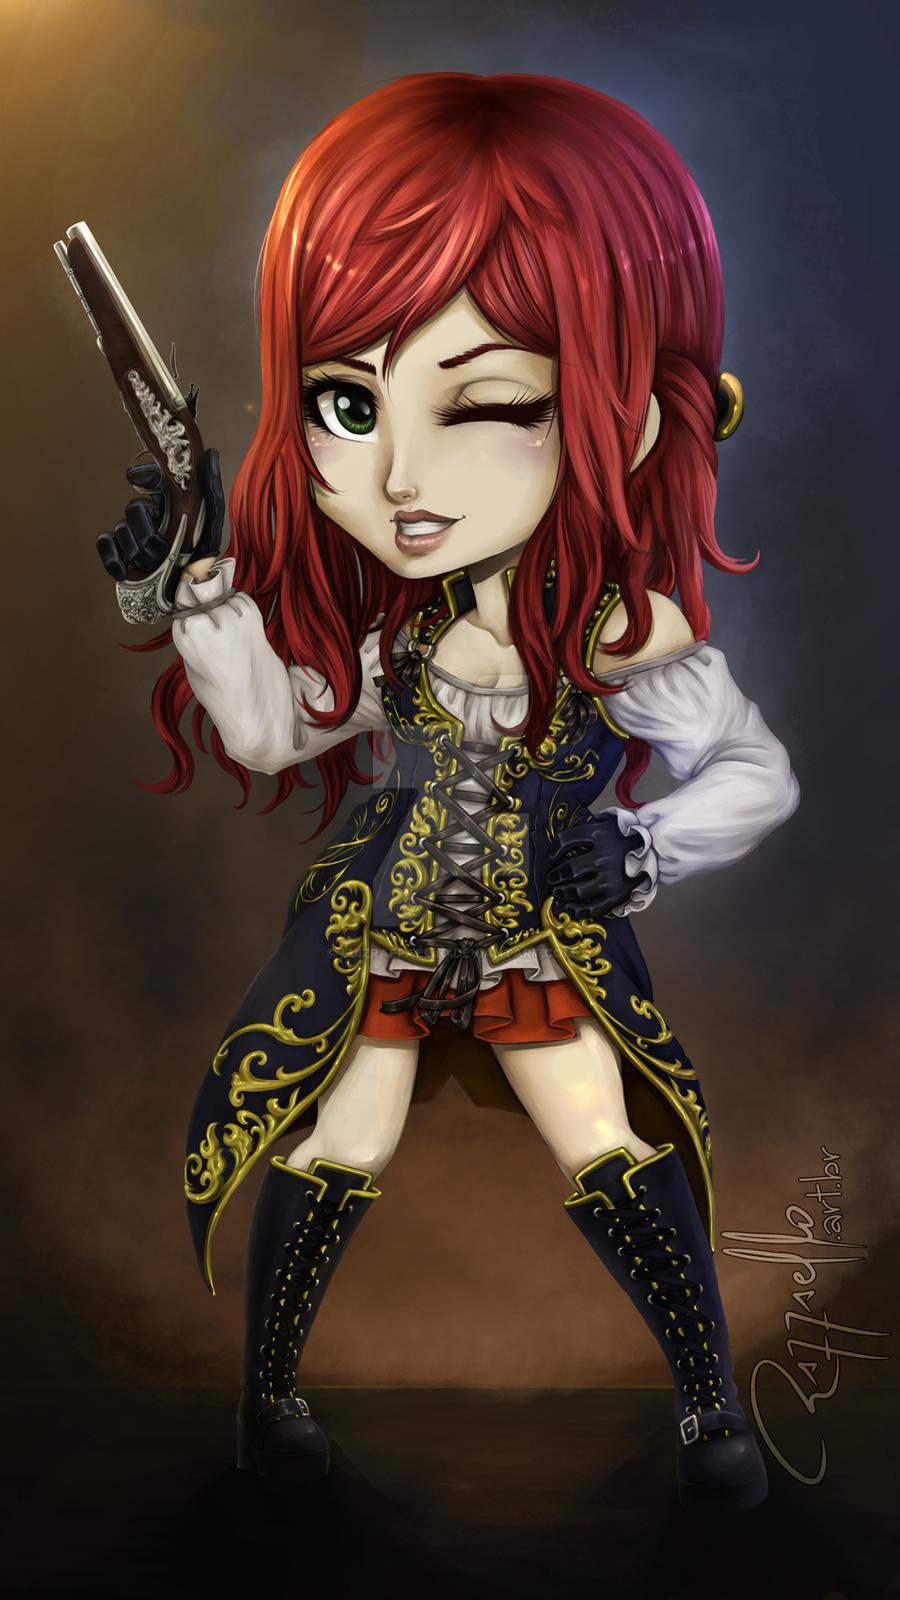 Chibi - Natasha Scarlet by LuizRaffaello